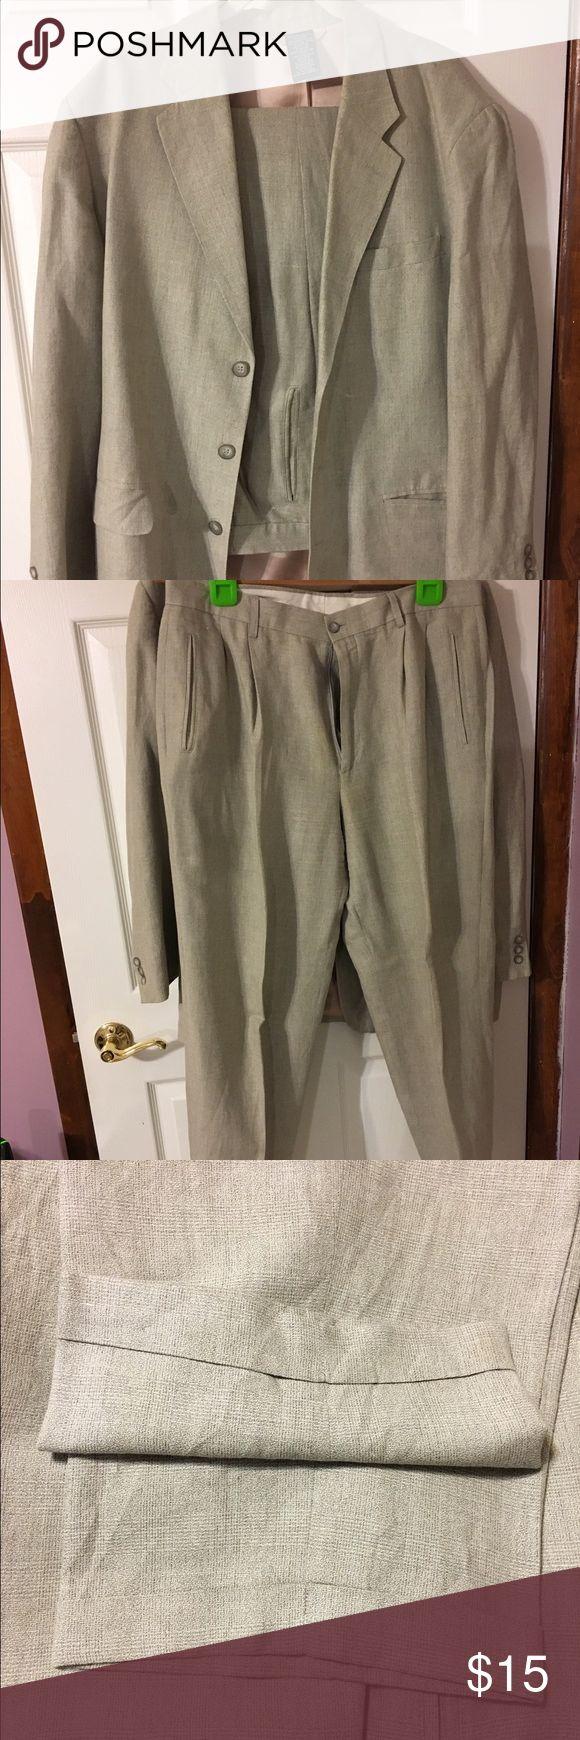 Claiborne beige suit Beige suit can be worn separate or together jacket size 42r pants 36x30 pants have cuffs claborne Suits & Blazers Suits